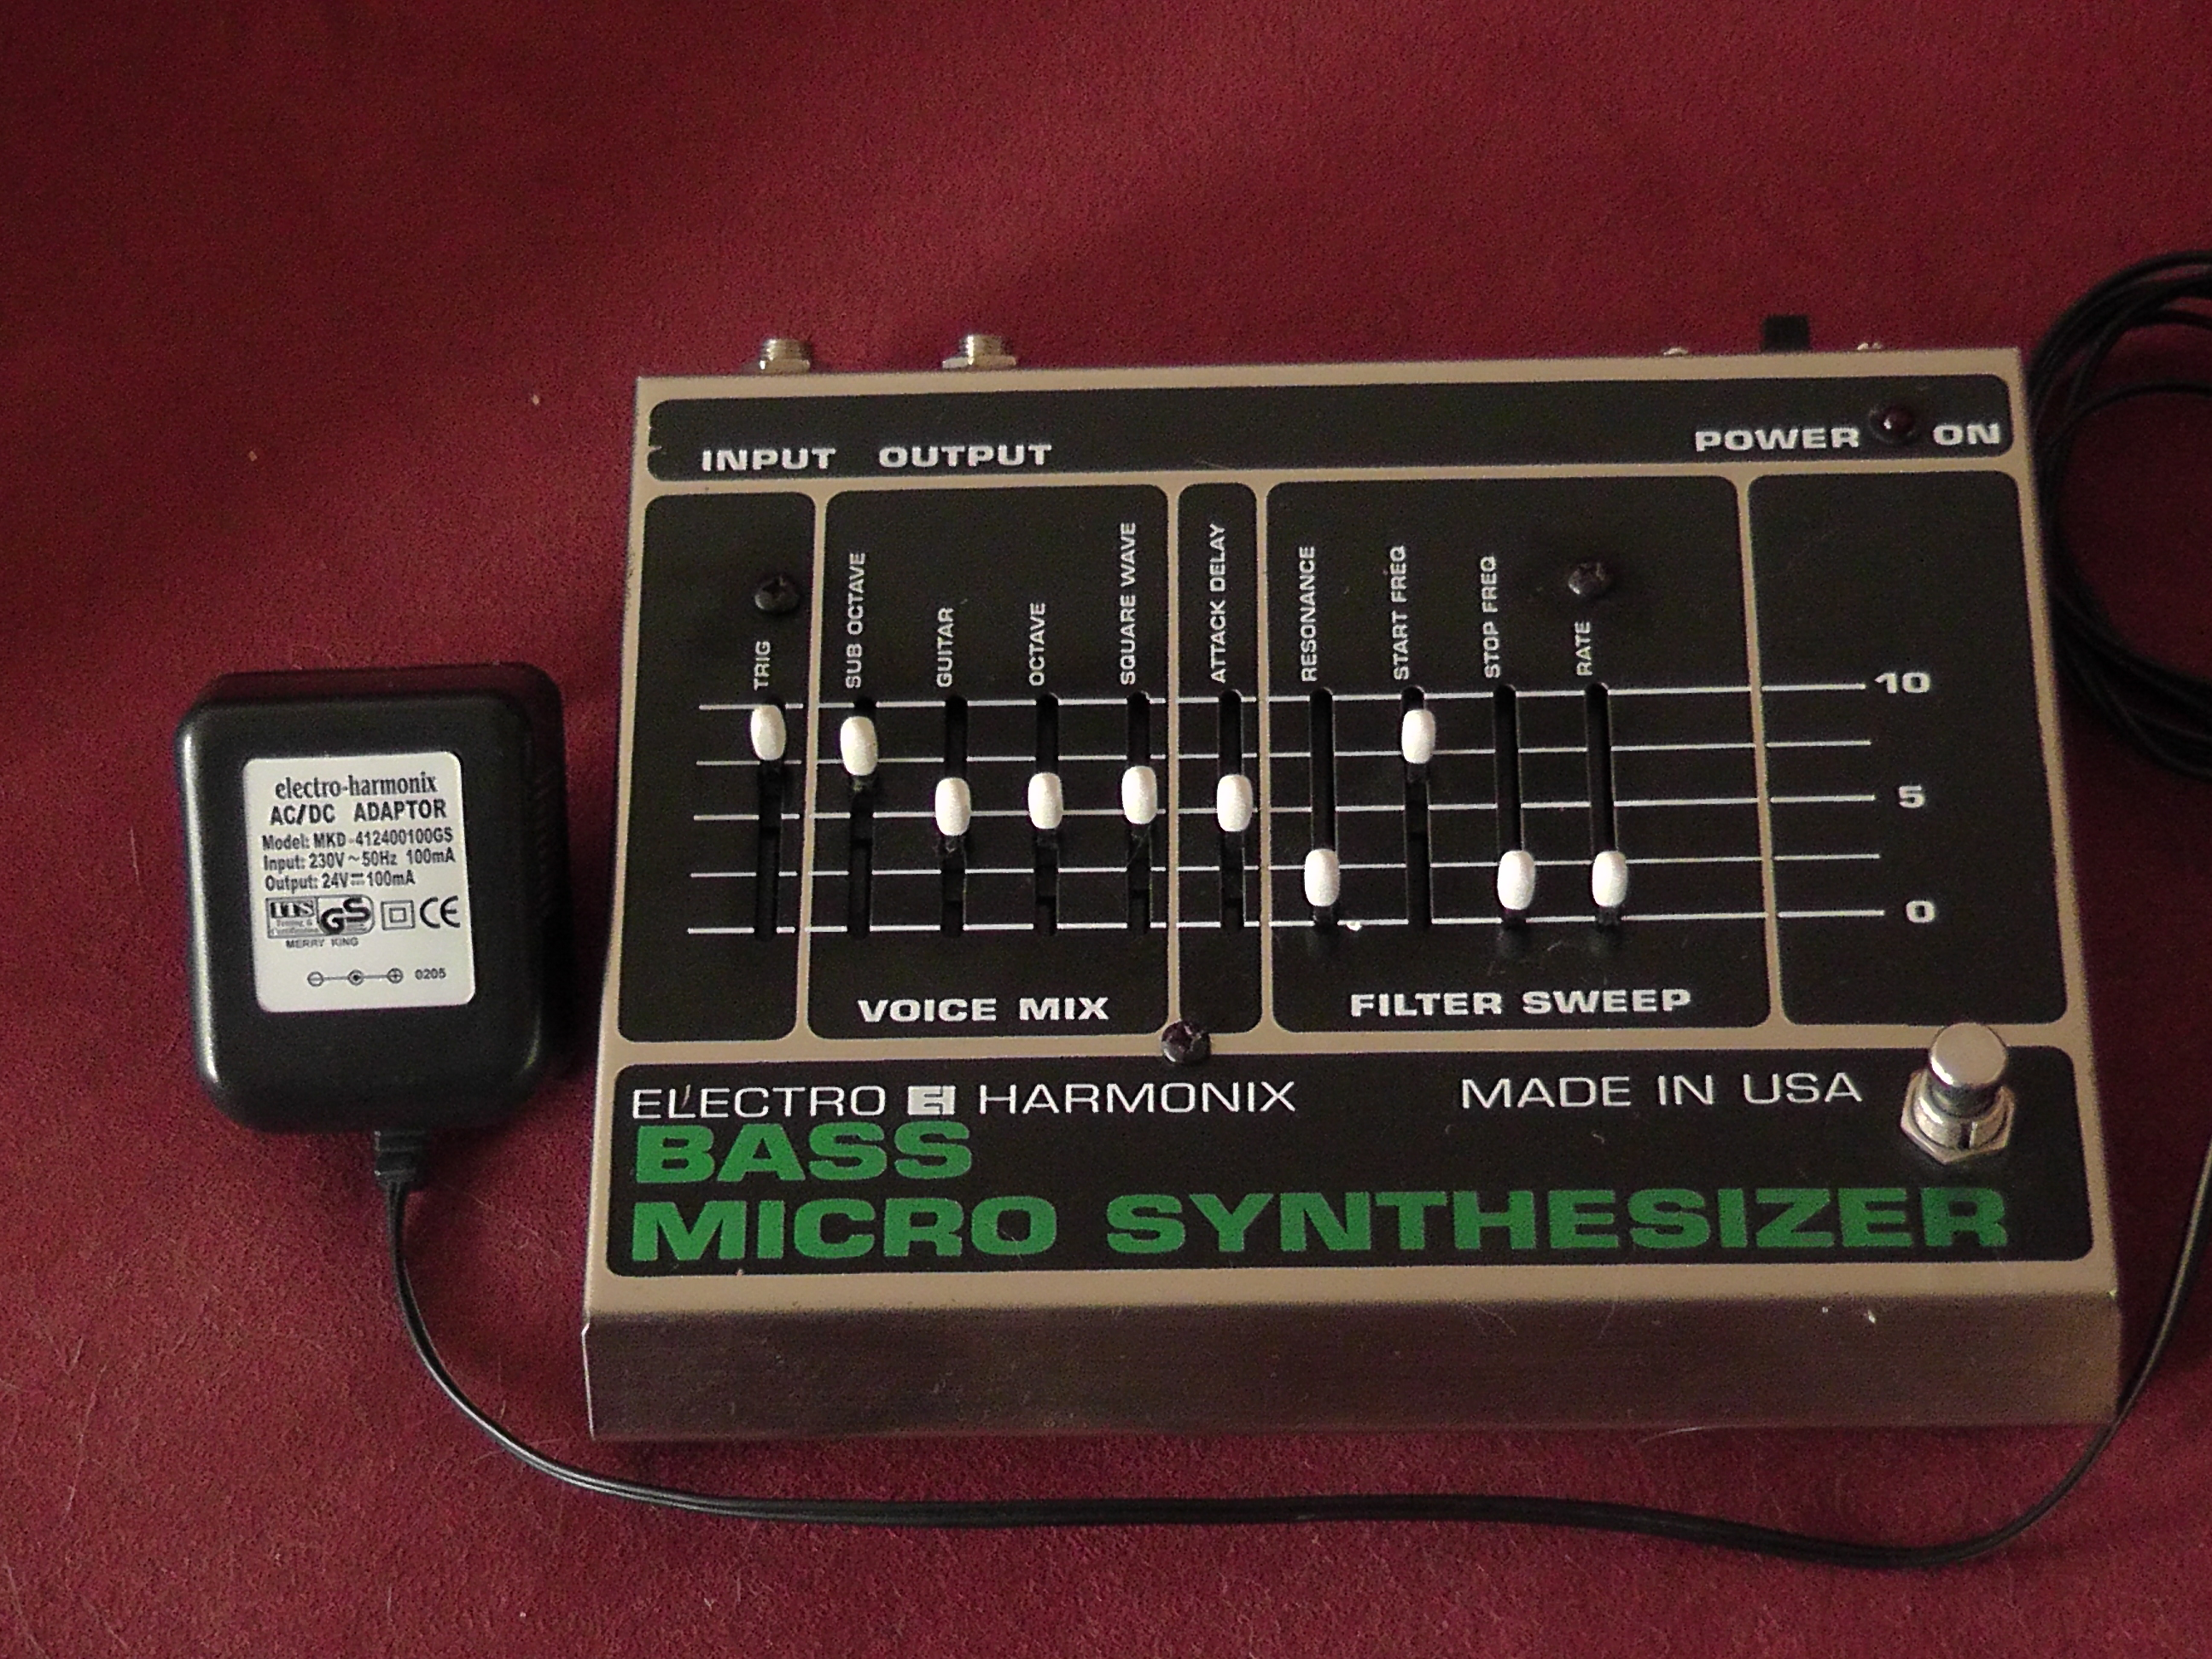 electro harmonix bass micro synthesizer image 339181 audiofanzine. Black Bedroom Furniture Sets. Home Design Ideas